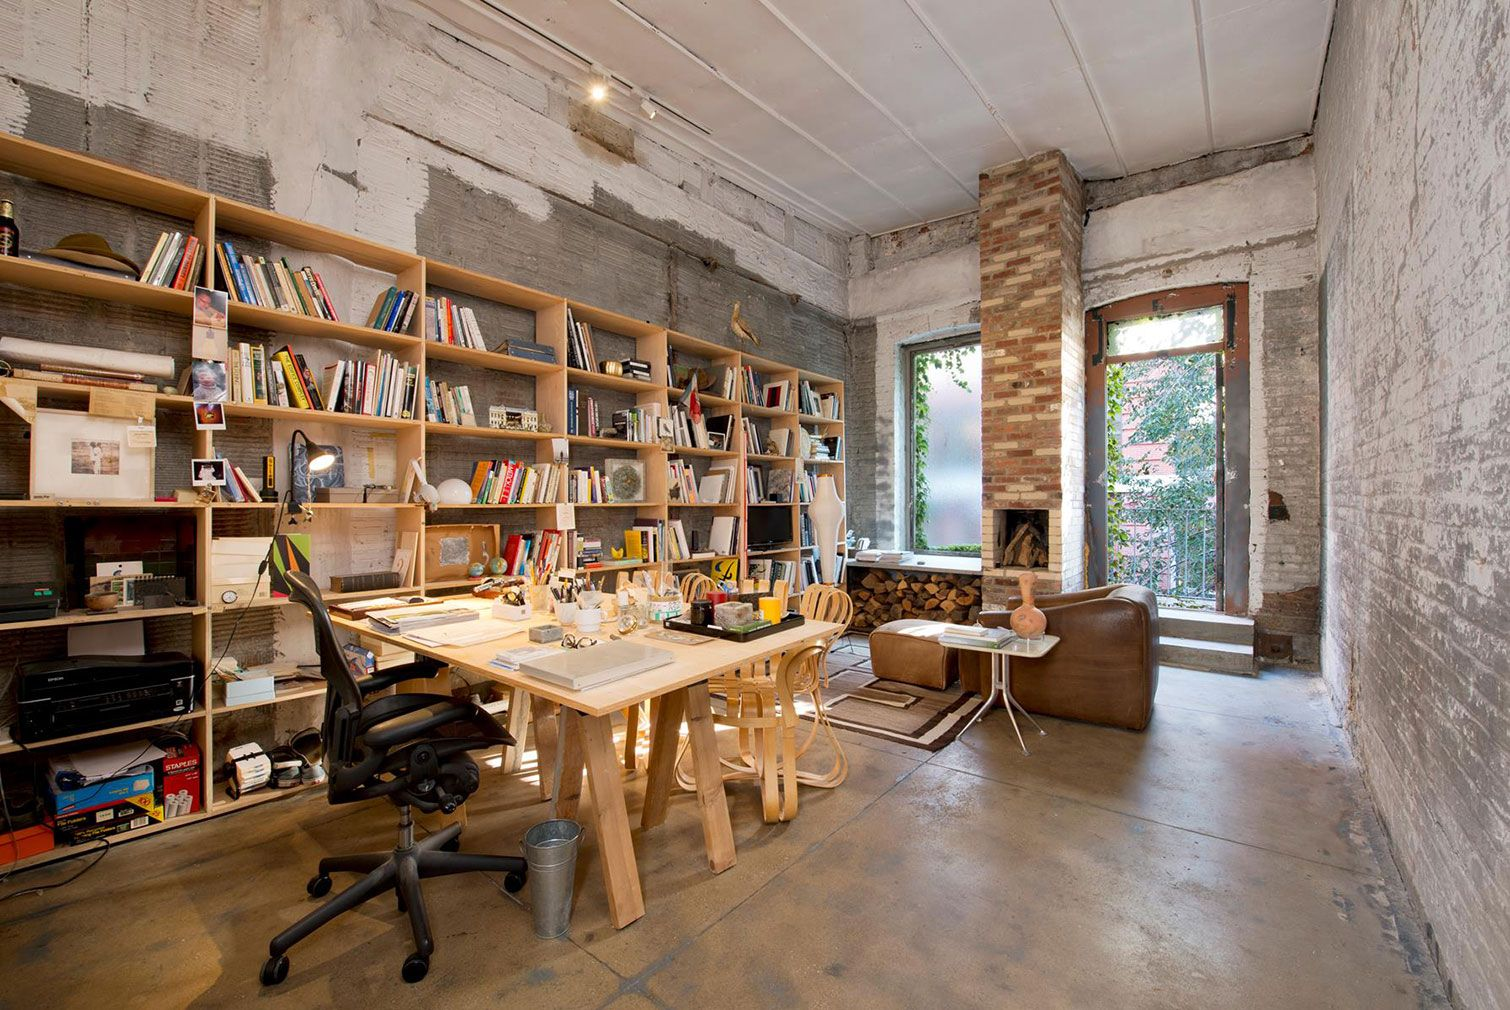 Minimalist concrete apartment lists for 11m in Manhattan